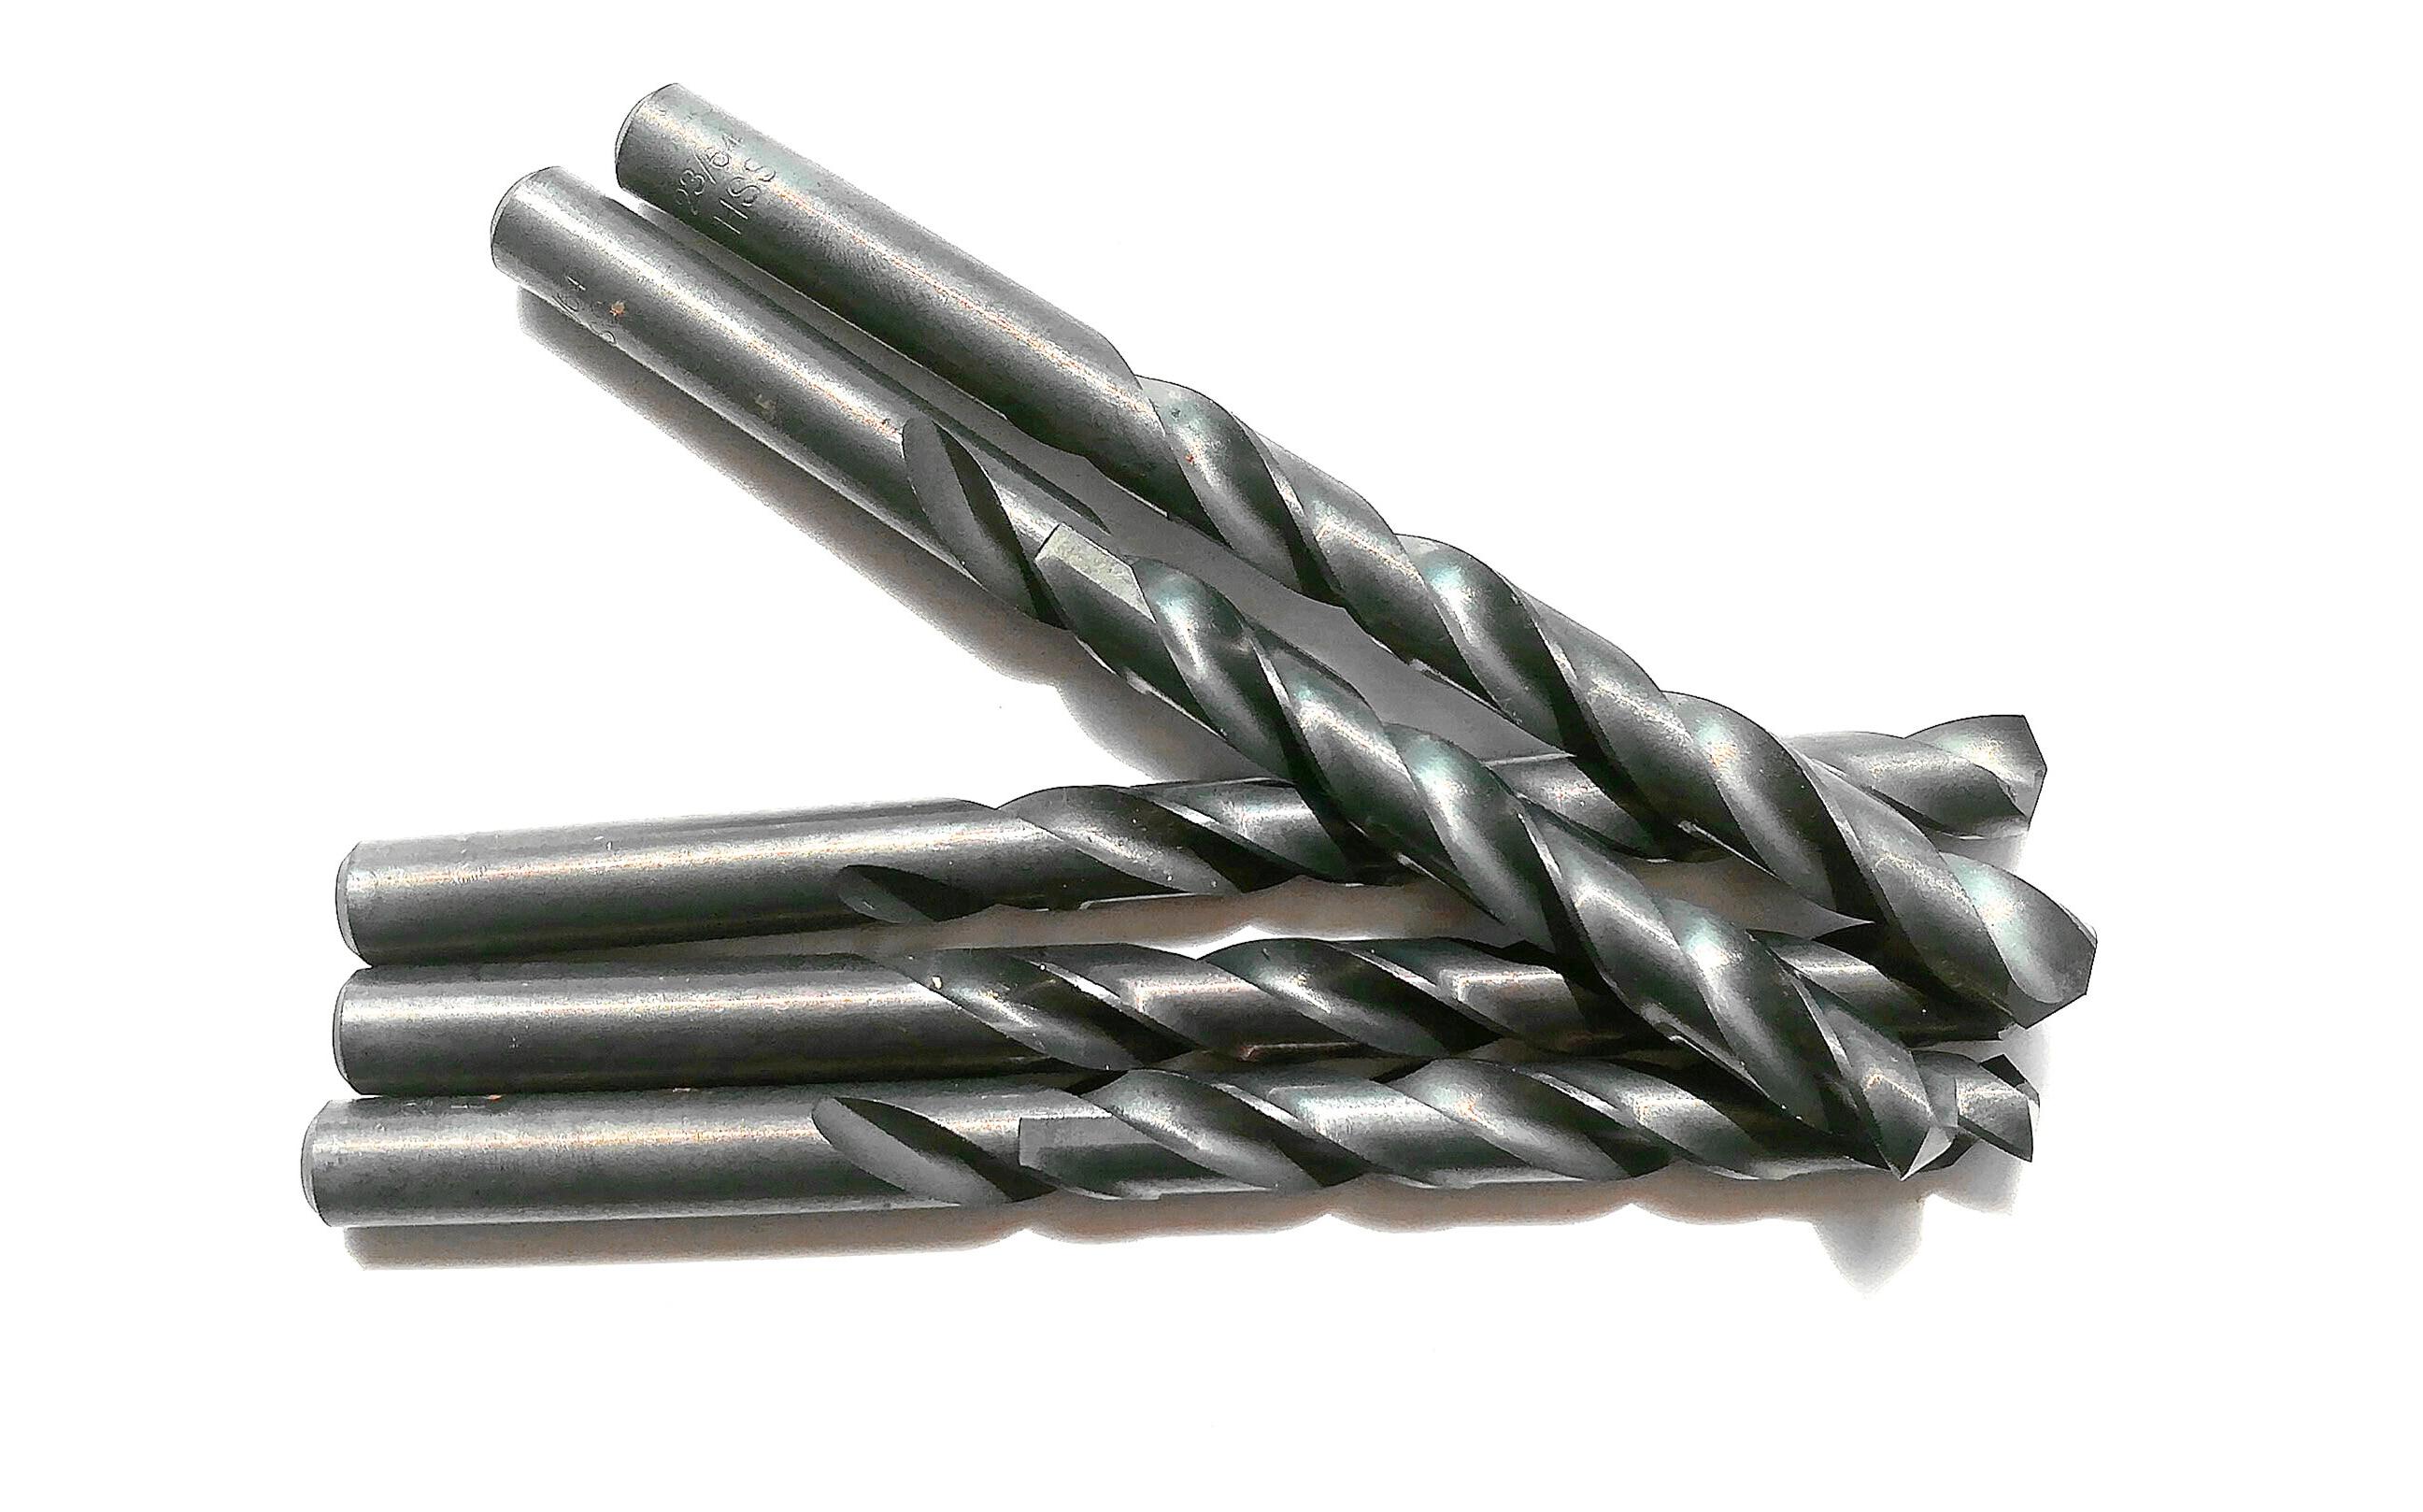 DRILLFORCE, 5Pcs 27/64 HSS Black Oxide Jobber Length Twist Drill Bit for Metal free shipping of 1pc hss 6542 made cnc full grinded hss taper shank twist drill bit 11 175mm for steel